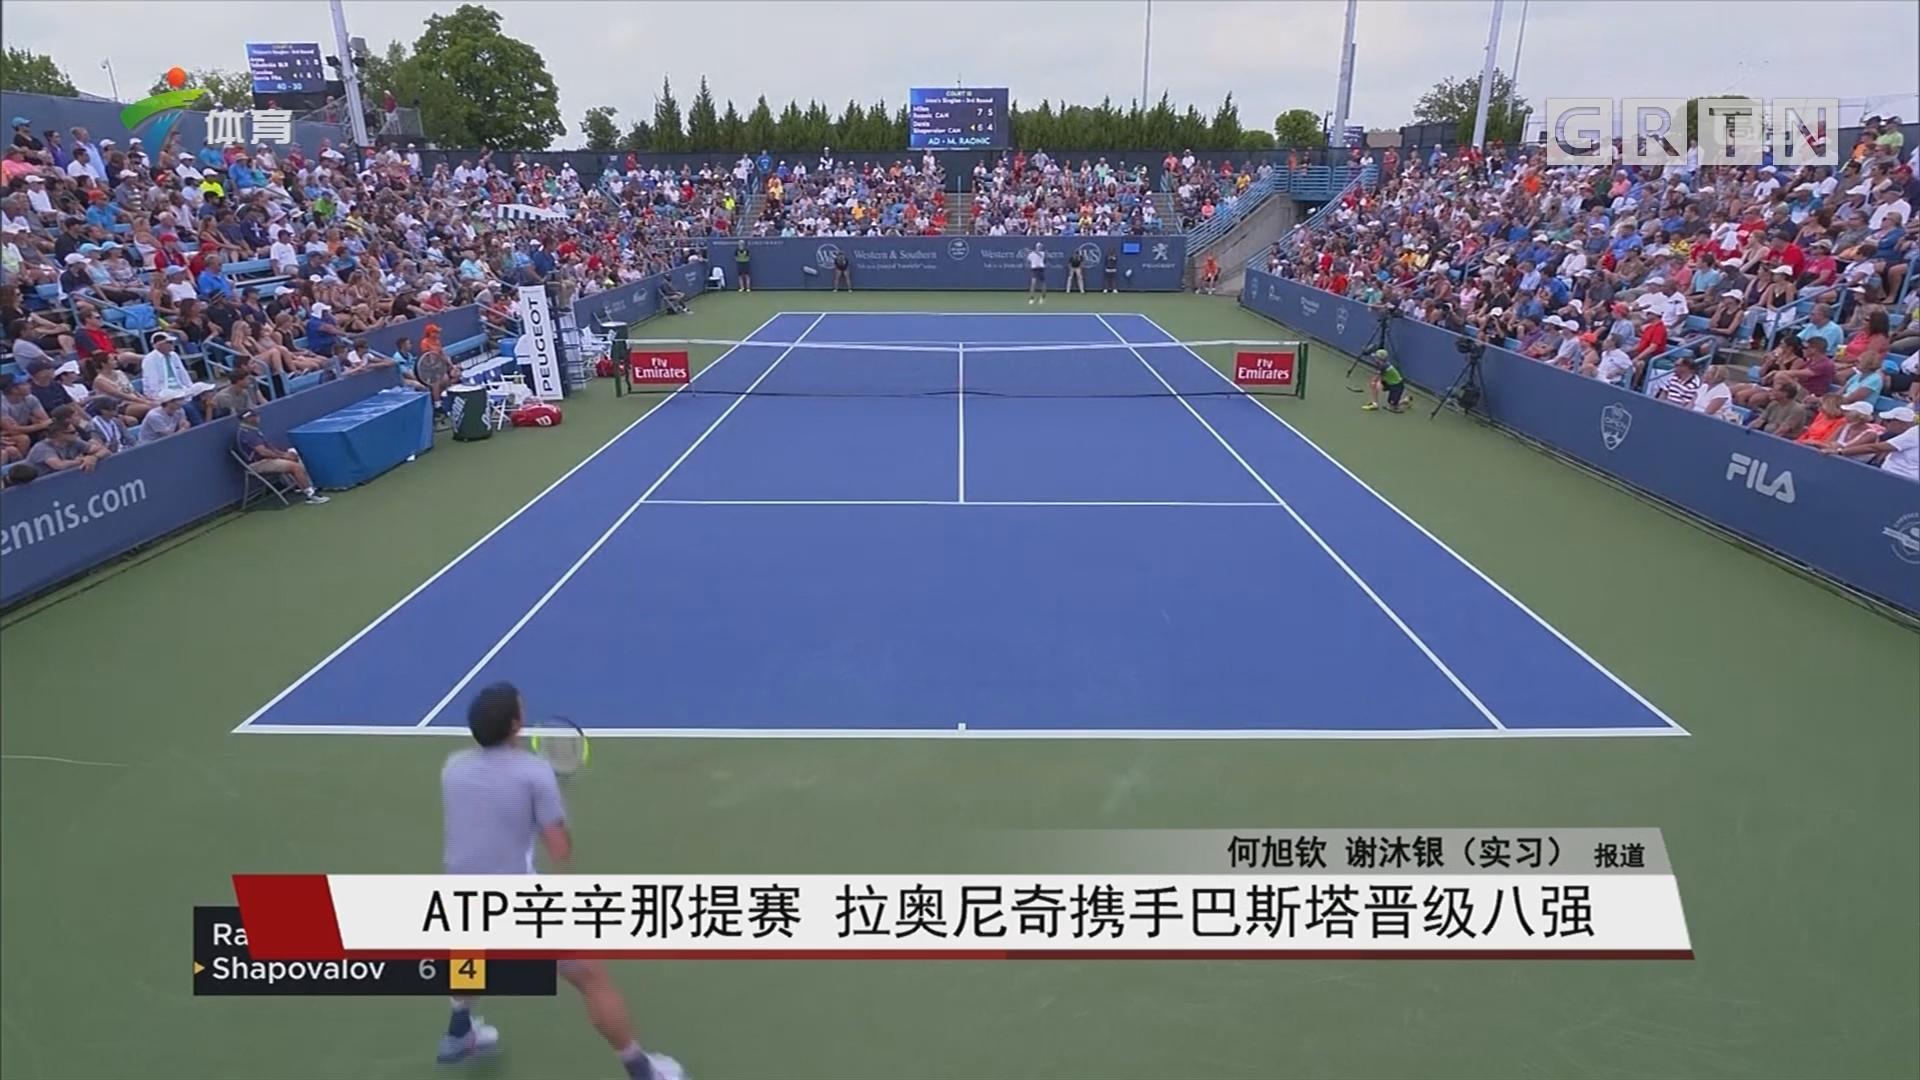 ATP辛辛那提赛 拉奥尼奇携手巴斯塔晋级八强